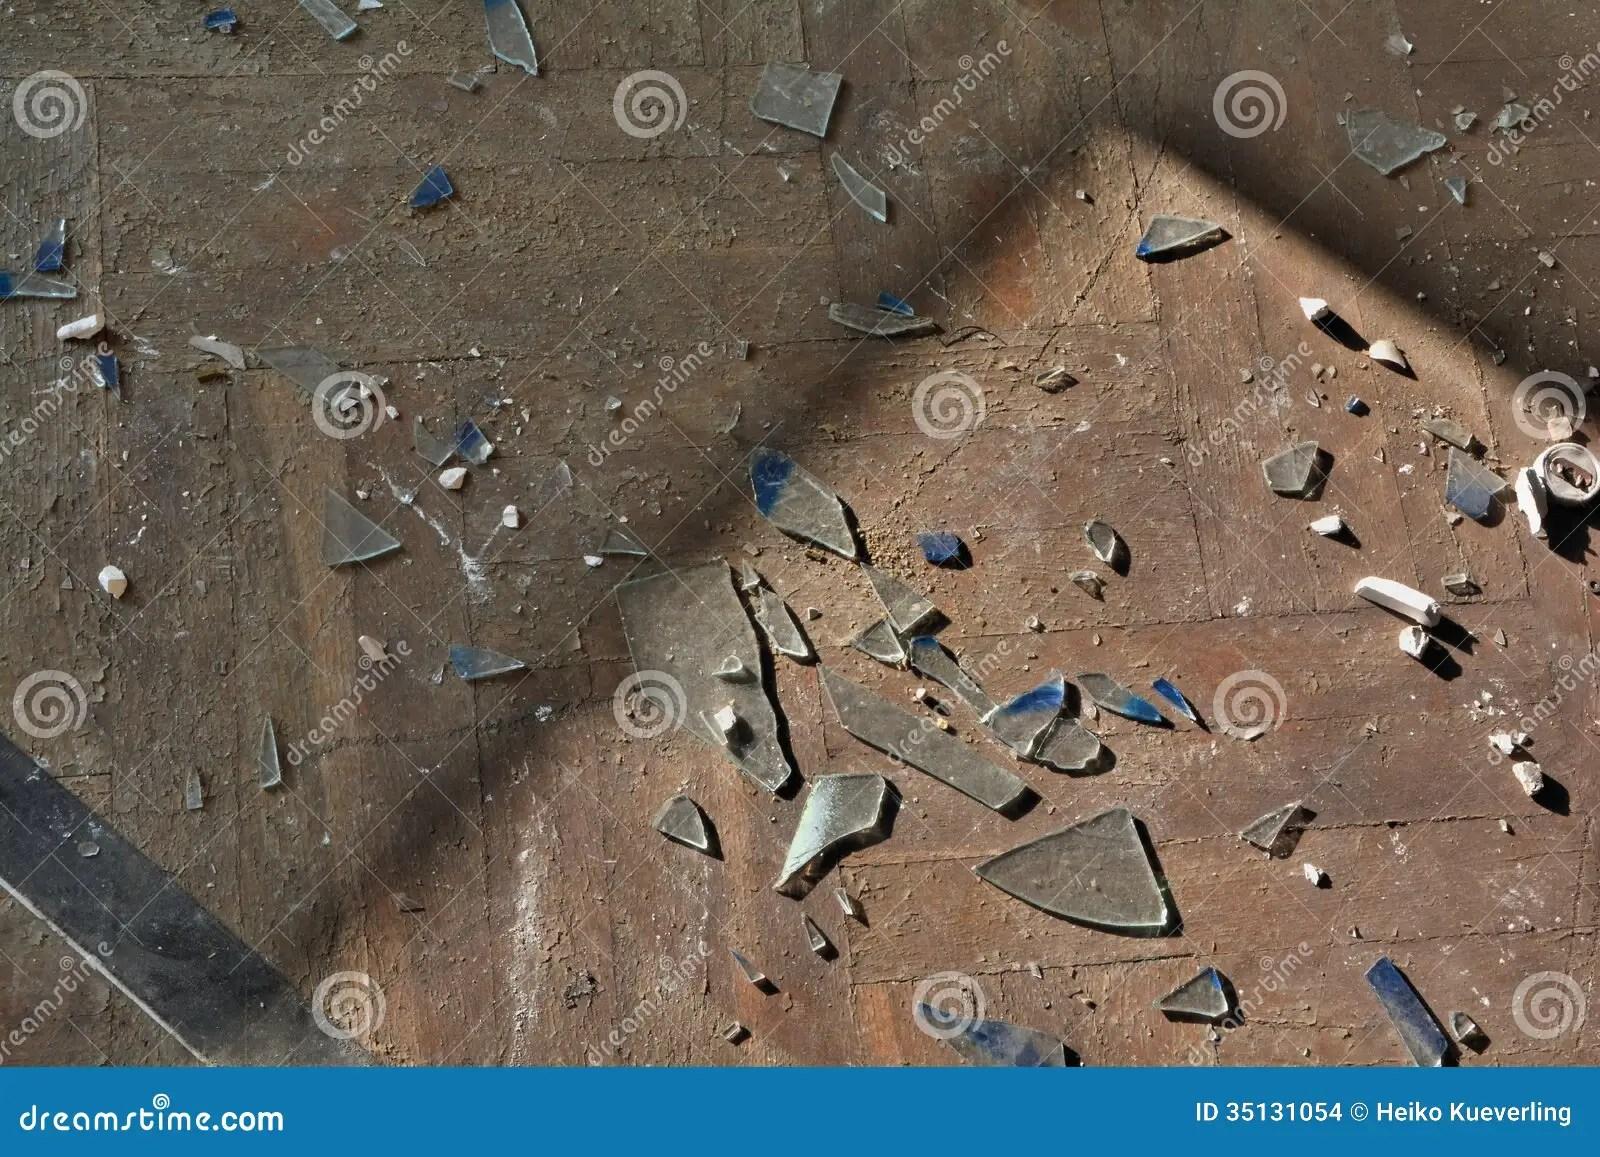 Broken Glass On A Floor Stock Photo Image Of Destruction